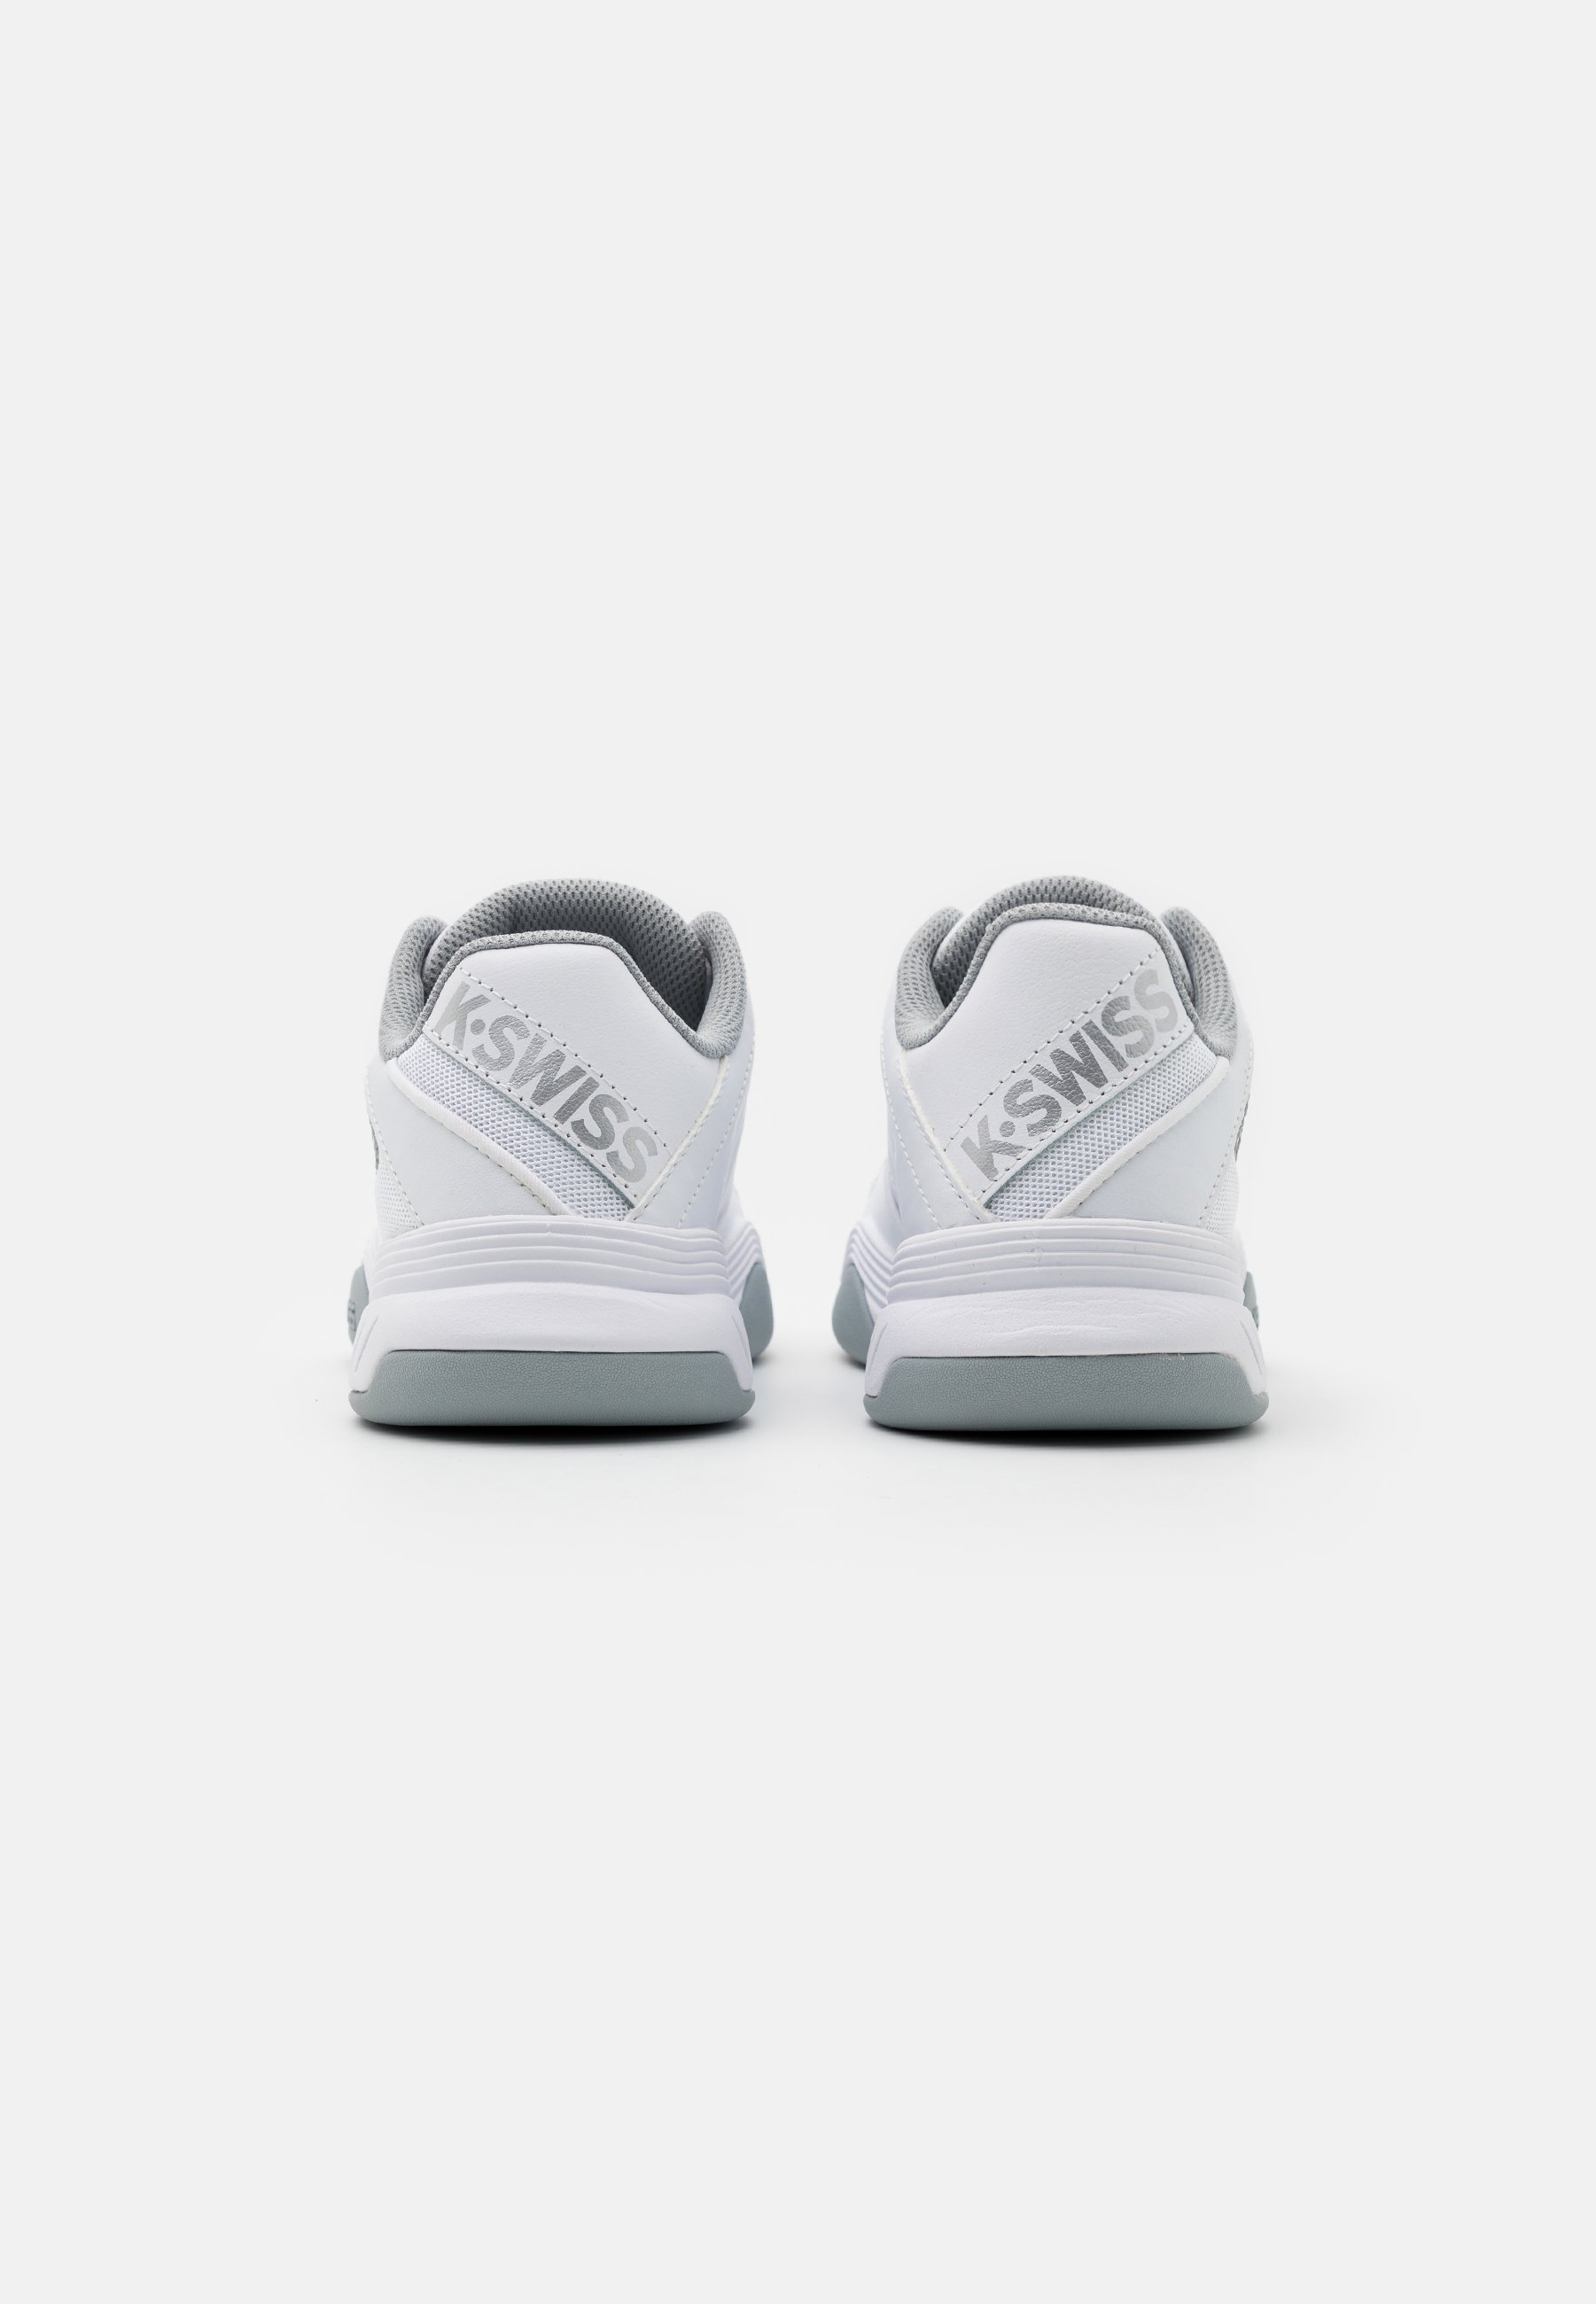 Nuovi prezzi più bassi Scarpe da Donna K-SWISS COURT EXPRESS CARPET Scarpe da tennis per terreno sintetico white/high rise/silver